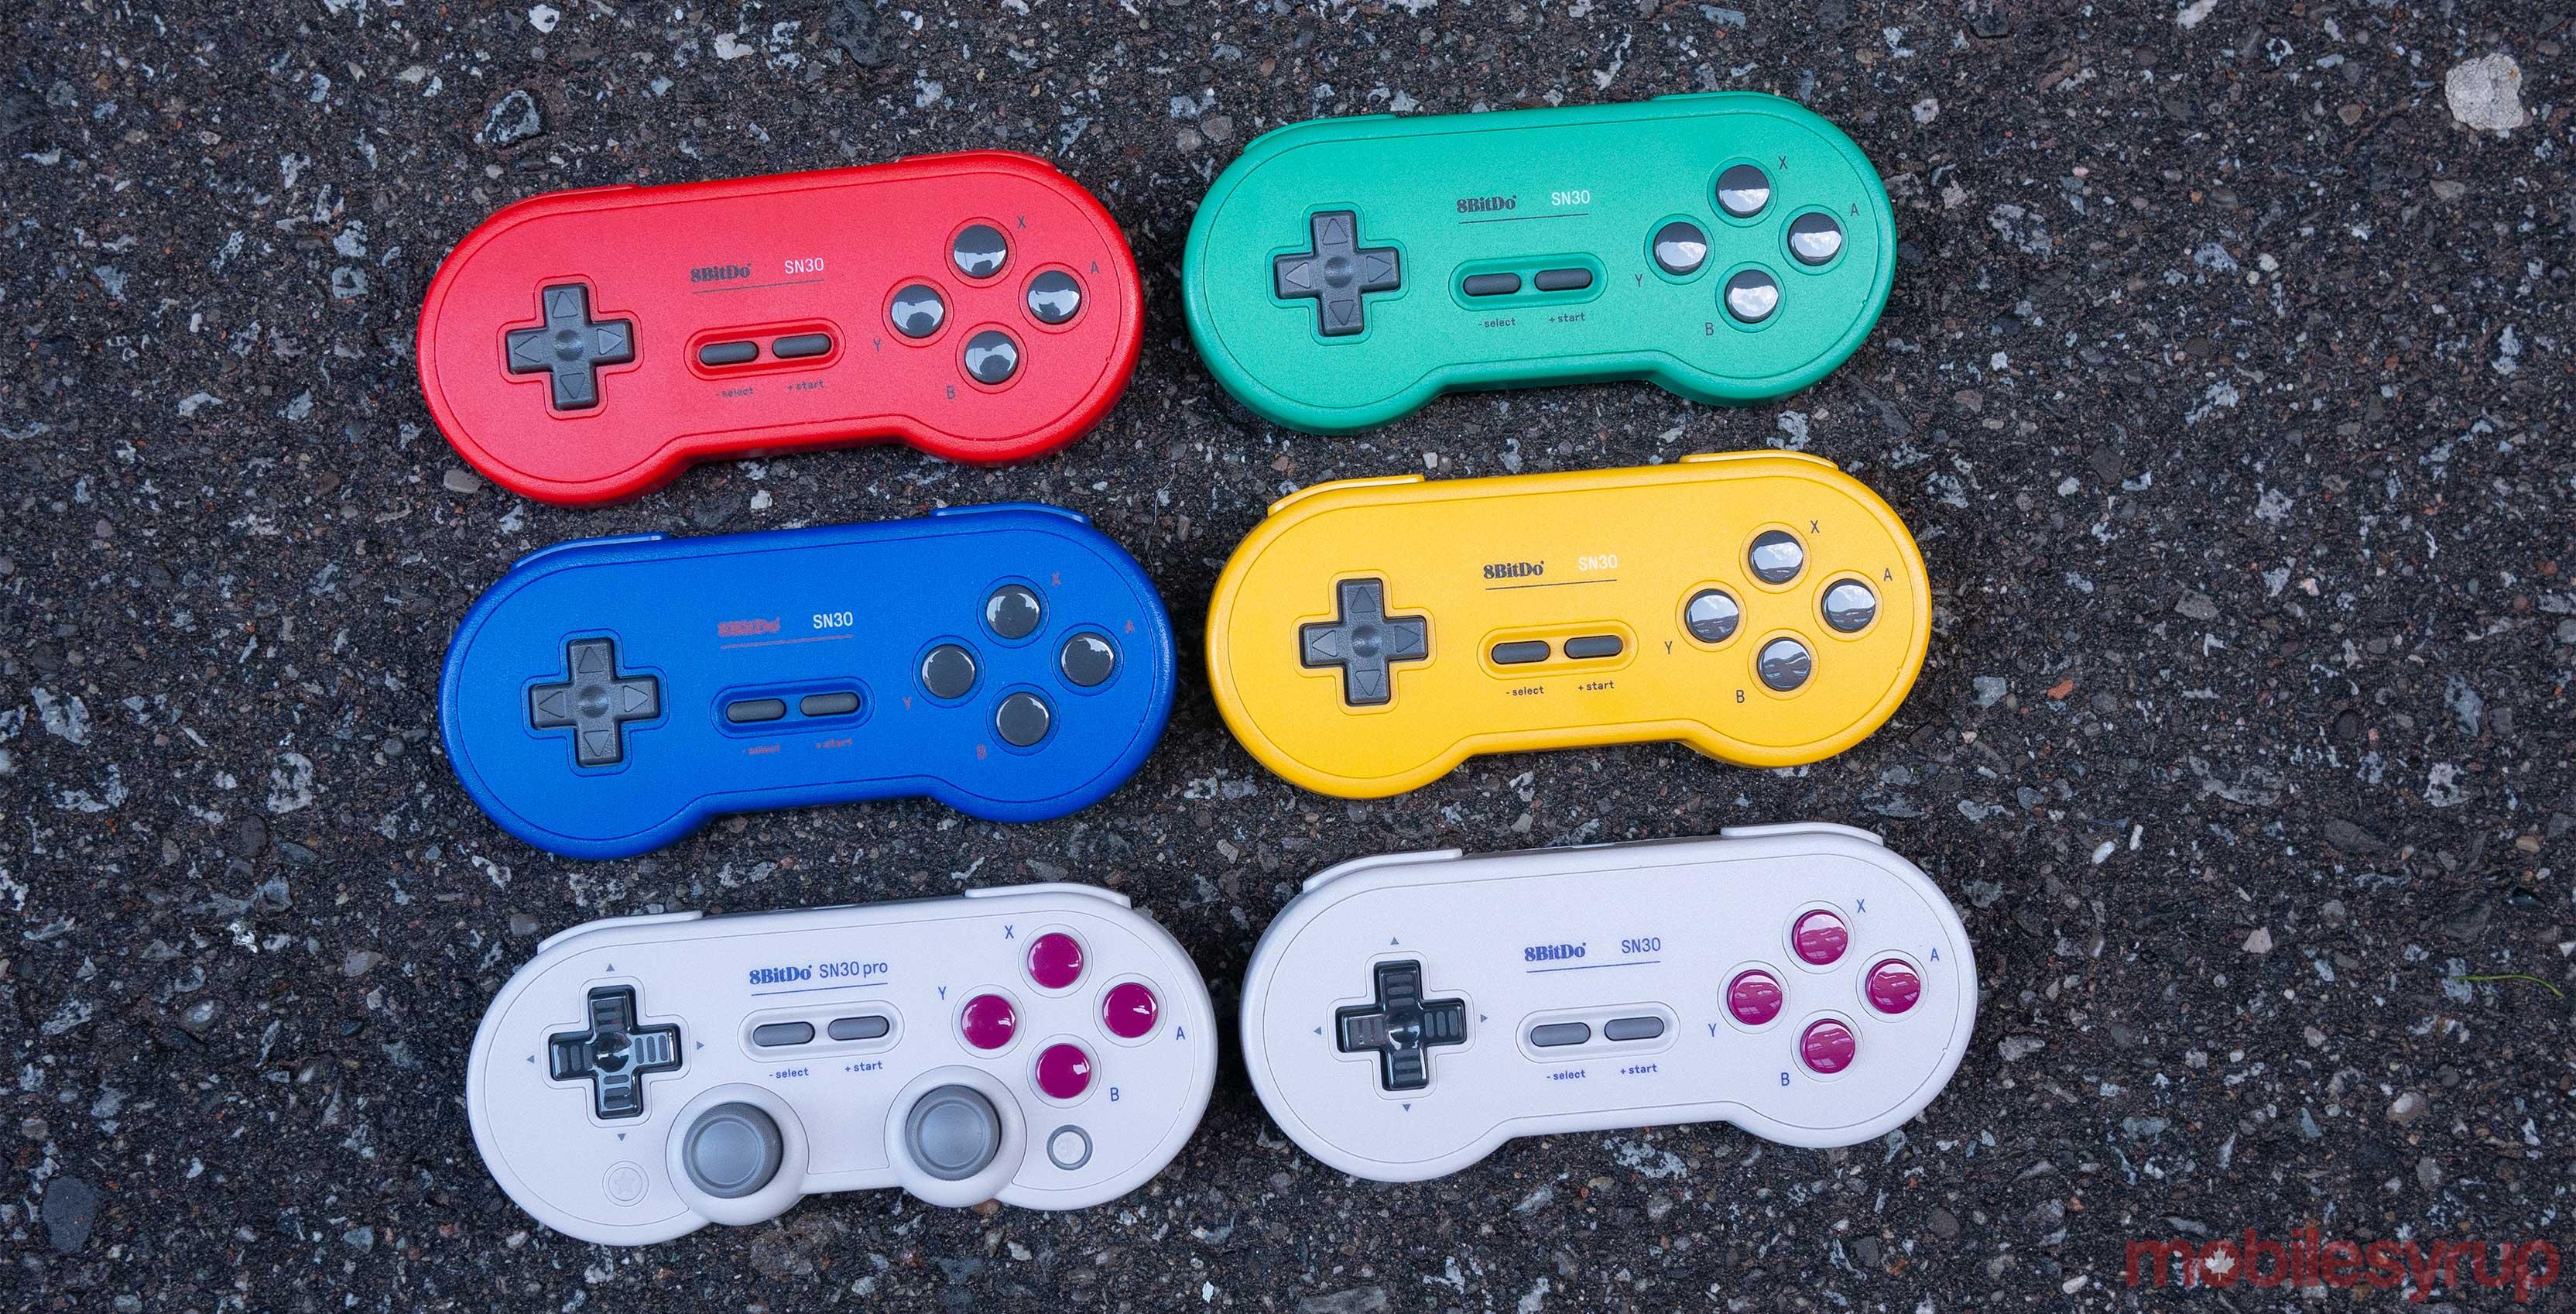 8Bitdo controllers